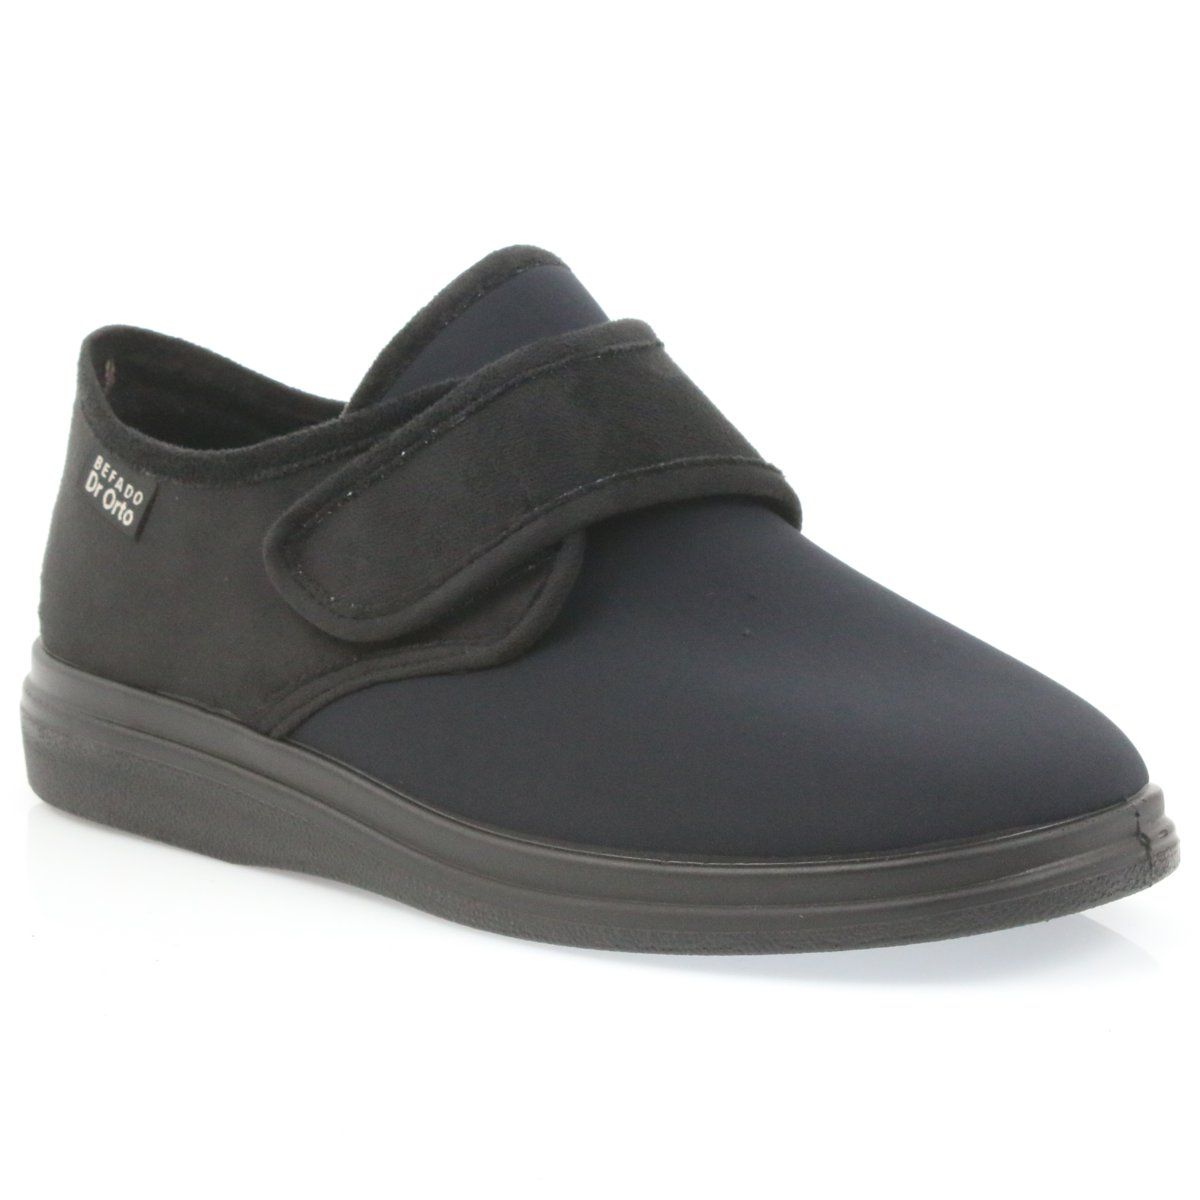 Domowe Damskie Befado Czarne Befado Obuwie Damskie Pu 036d006 Women Shoes Shoes Homemade Shoes